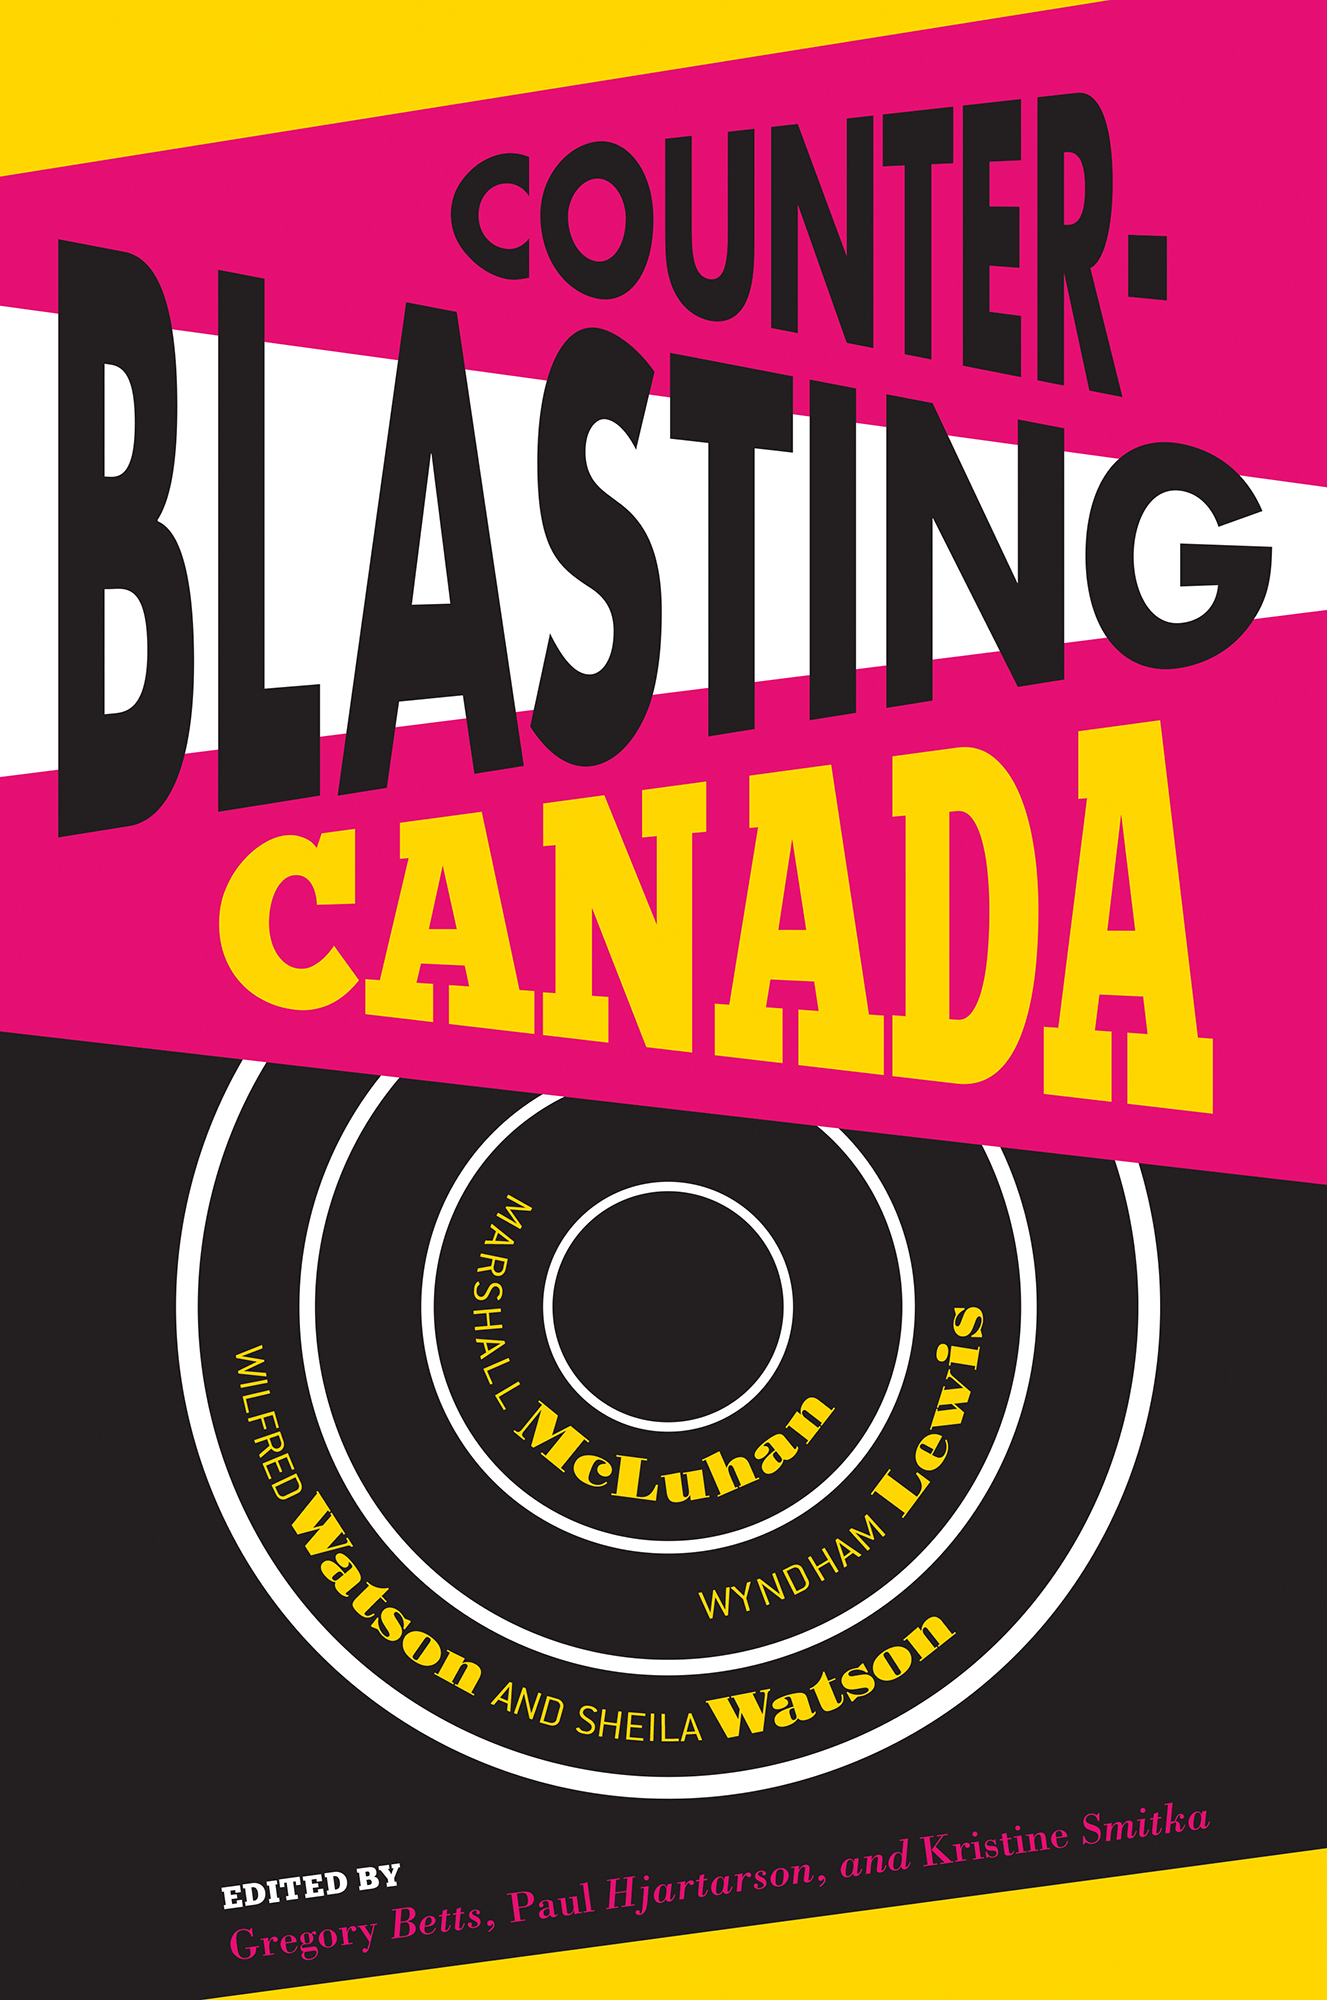 Counterblasting Canada